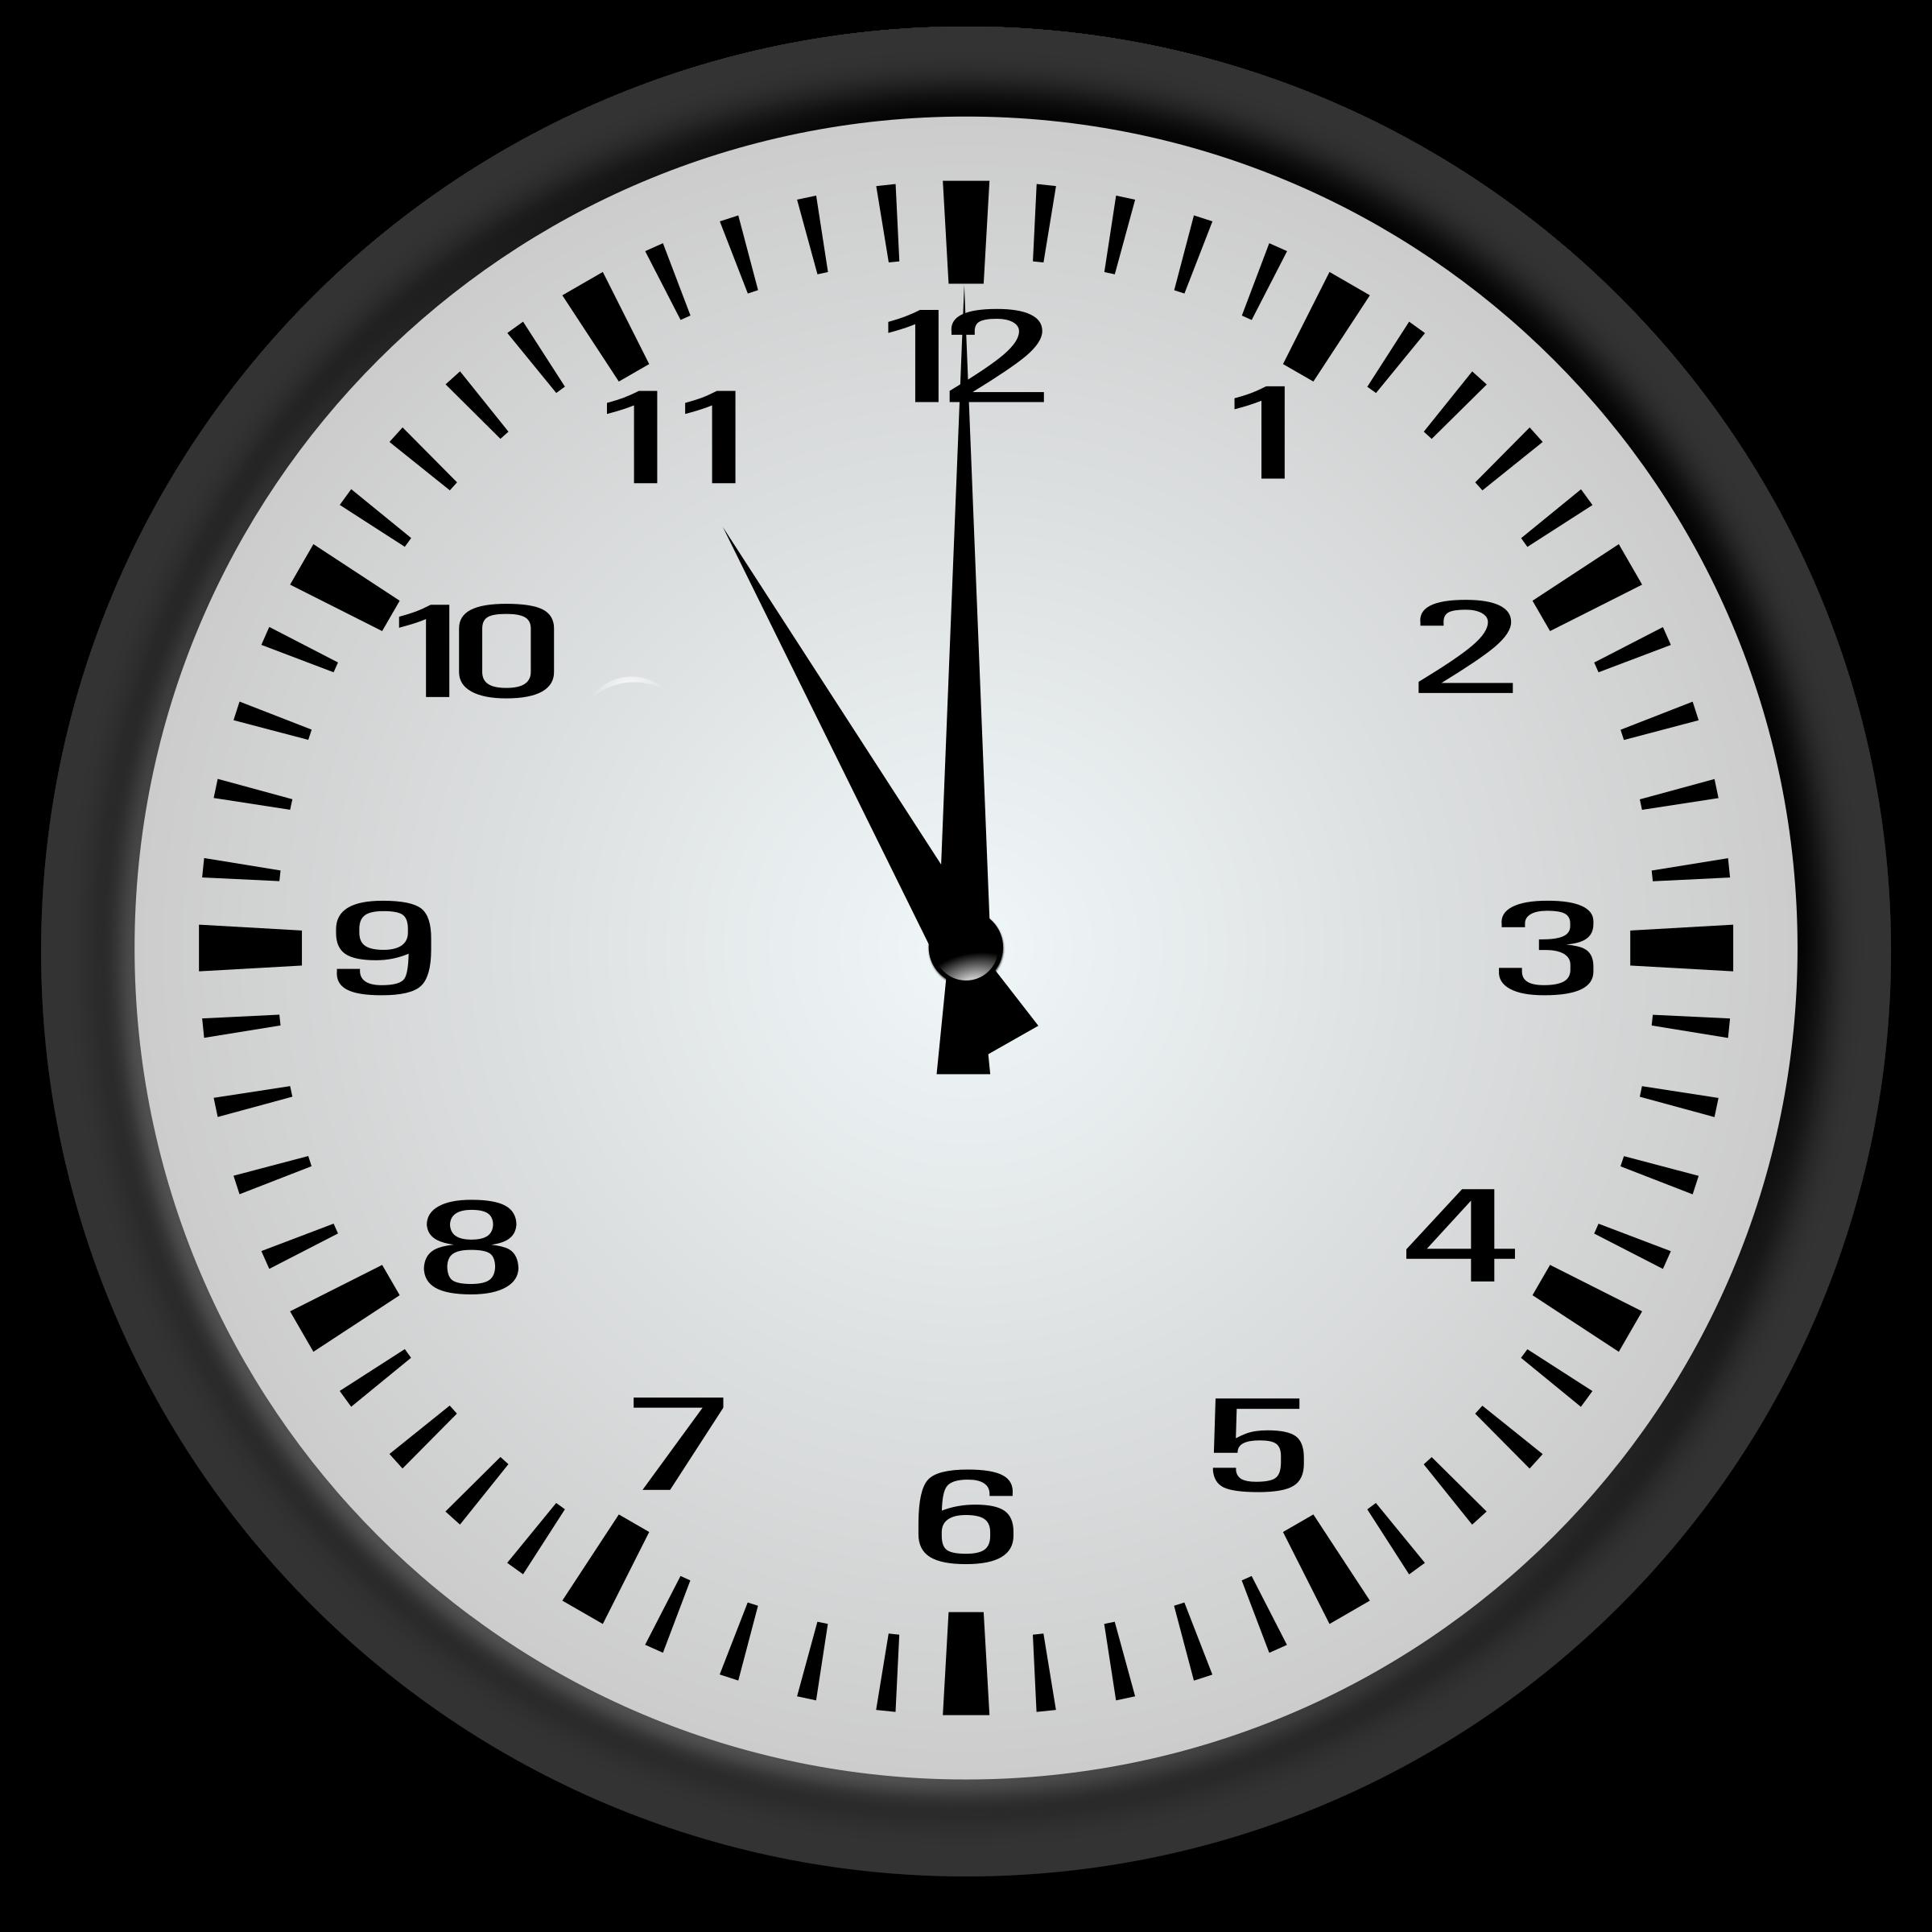 Clipart - 11 o'clock